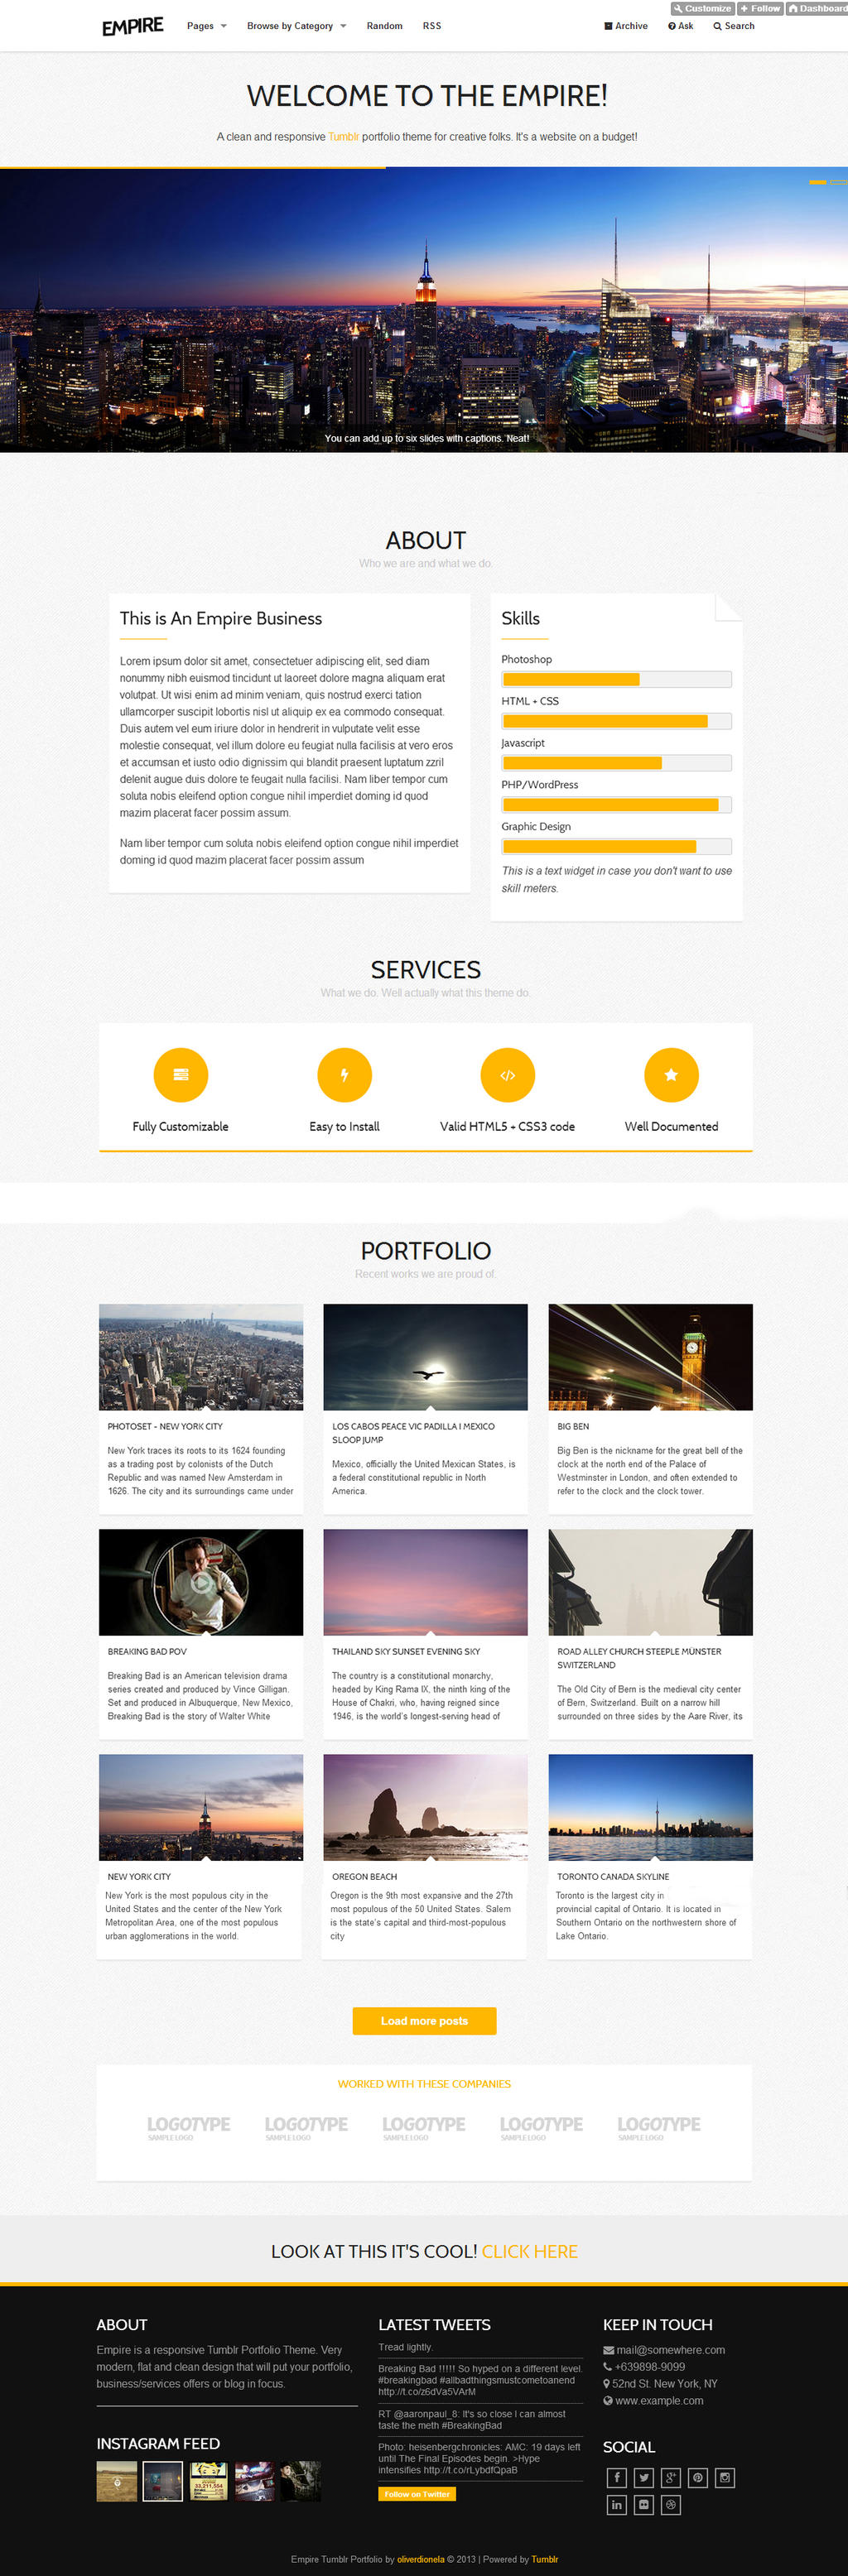 Empire - Responsive Tumblr Portfolio Theme by odionela